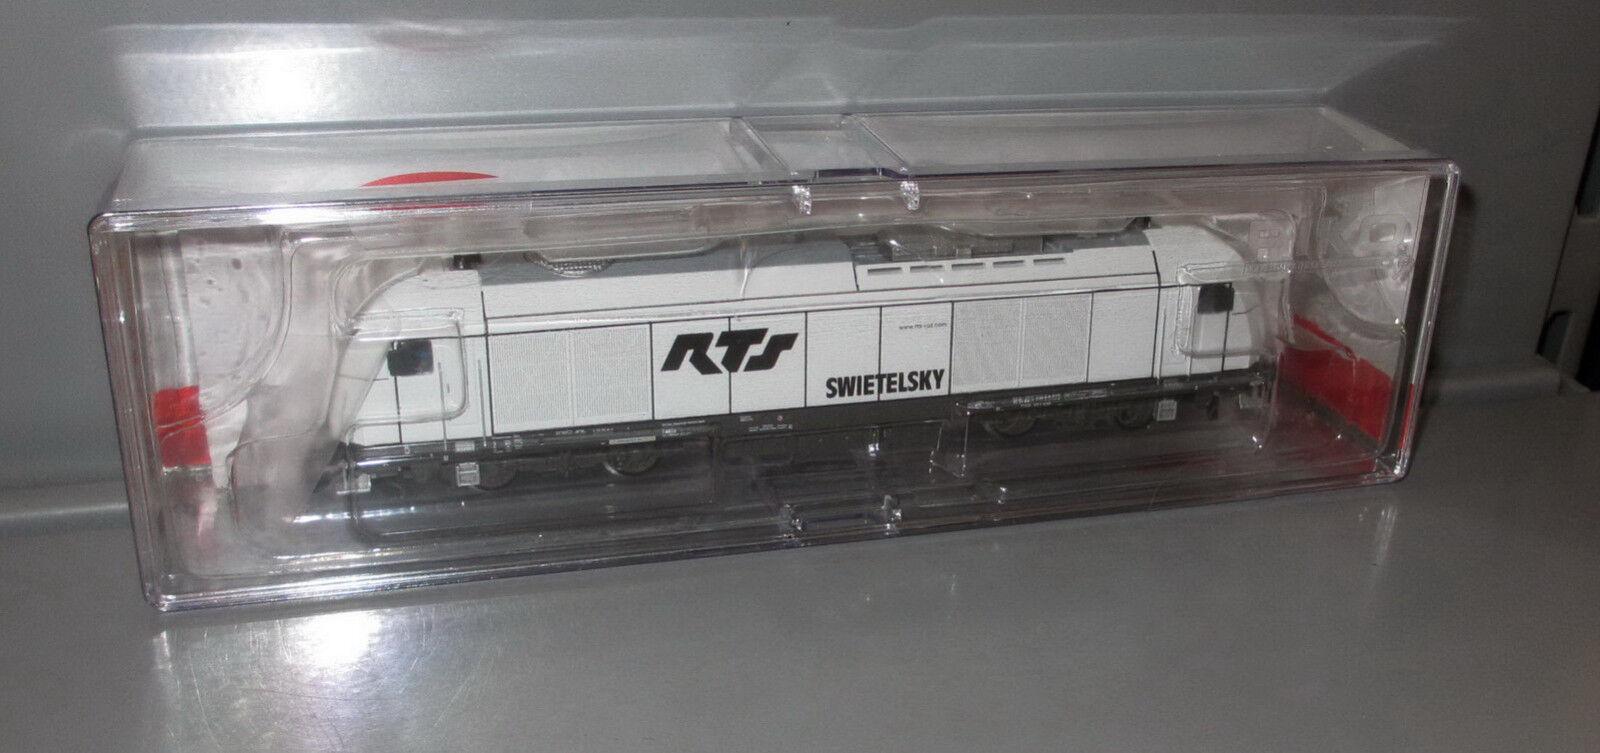 Piko TT 47598 RTS diesellok  Hércules  RTS, época vi _ nuevo